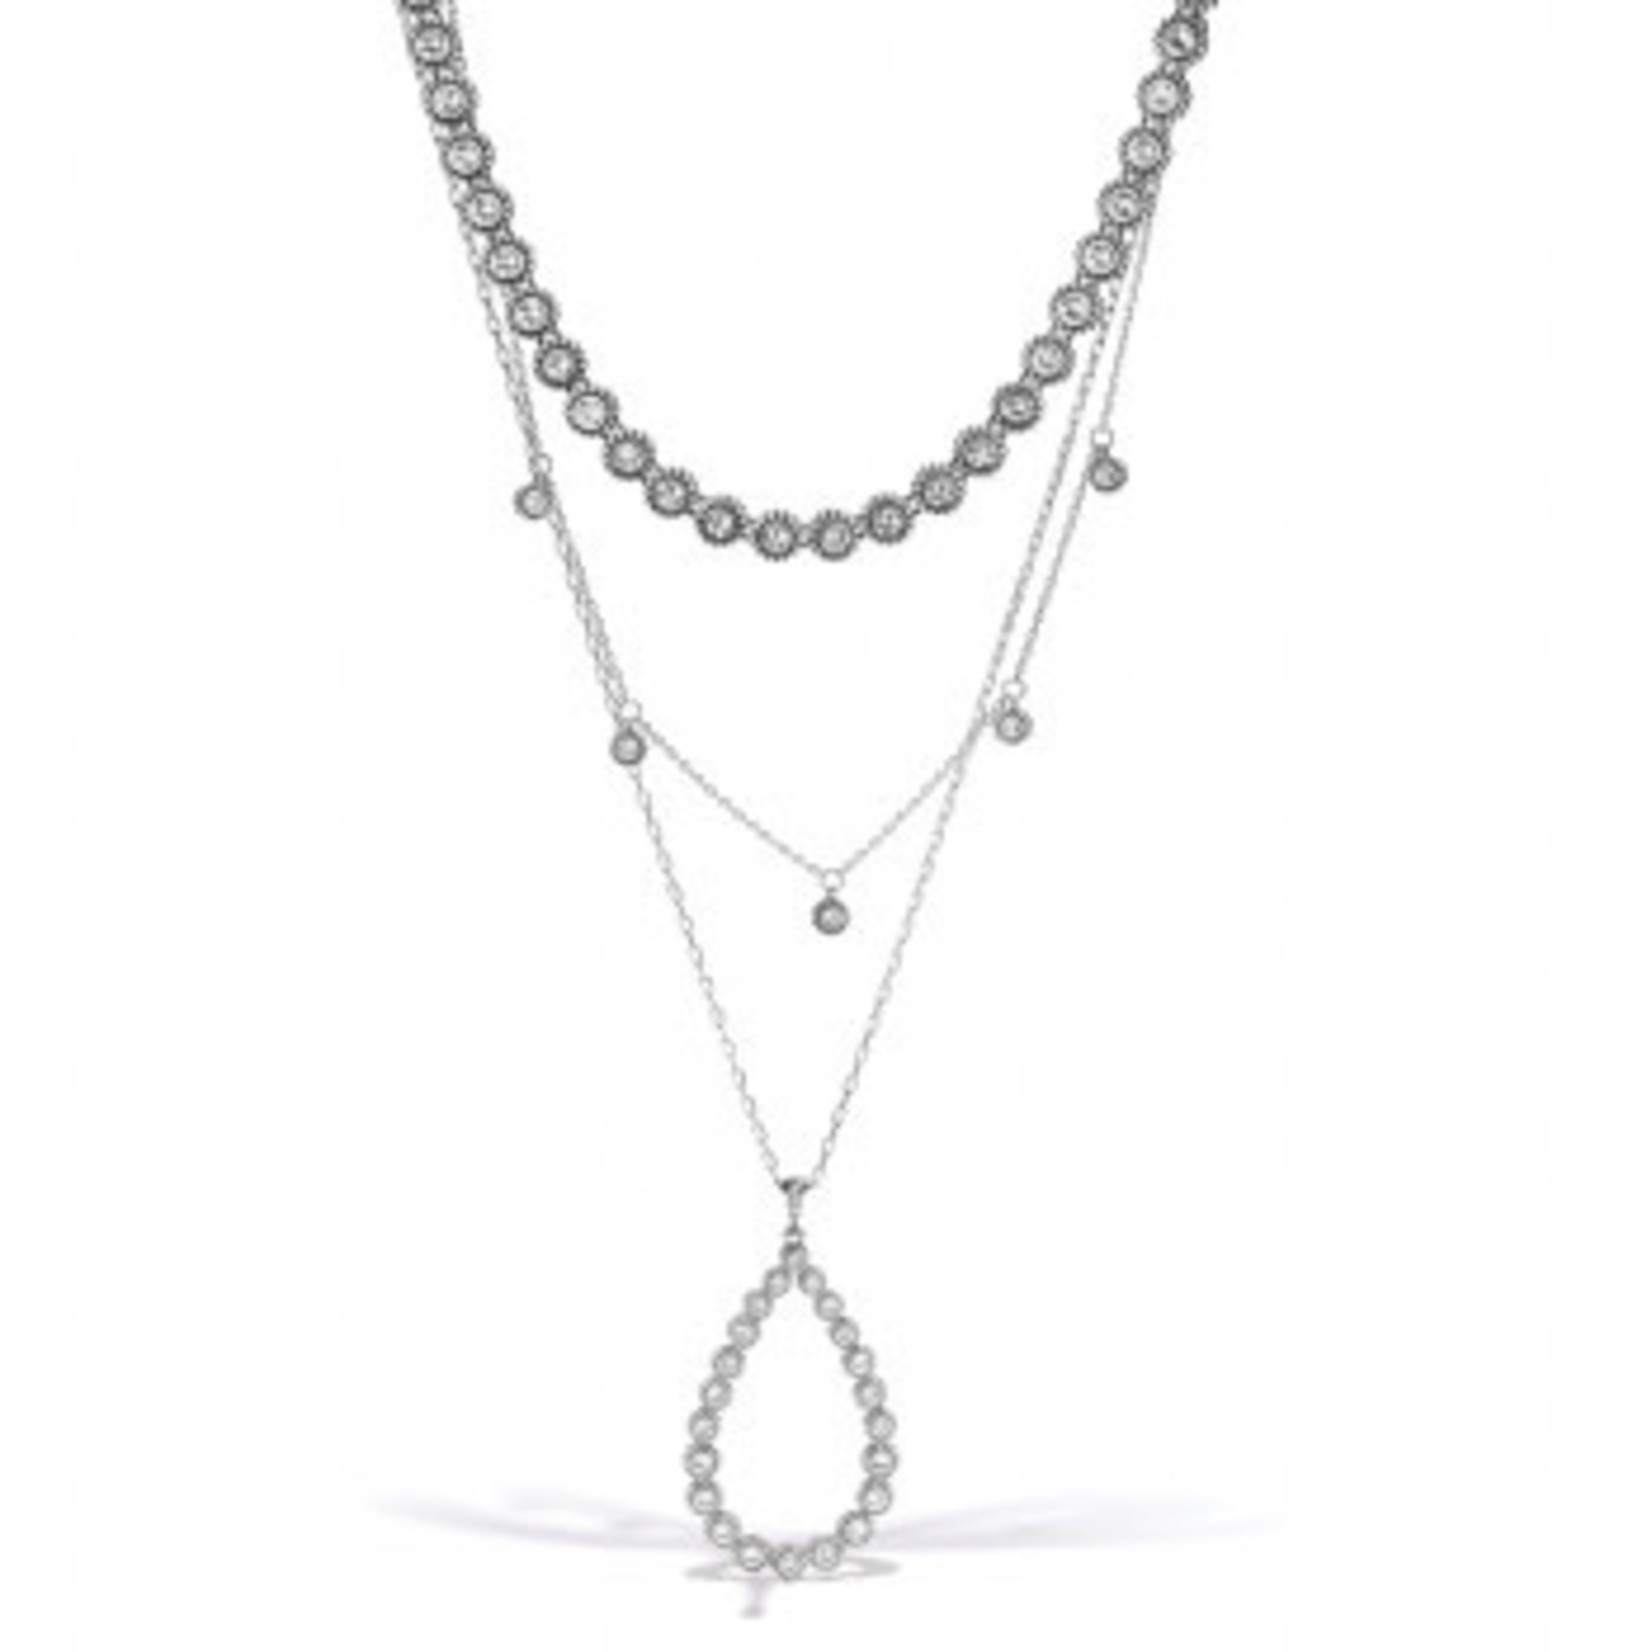 Brighton Twinkle Splendor Teardrop Necklace Silver